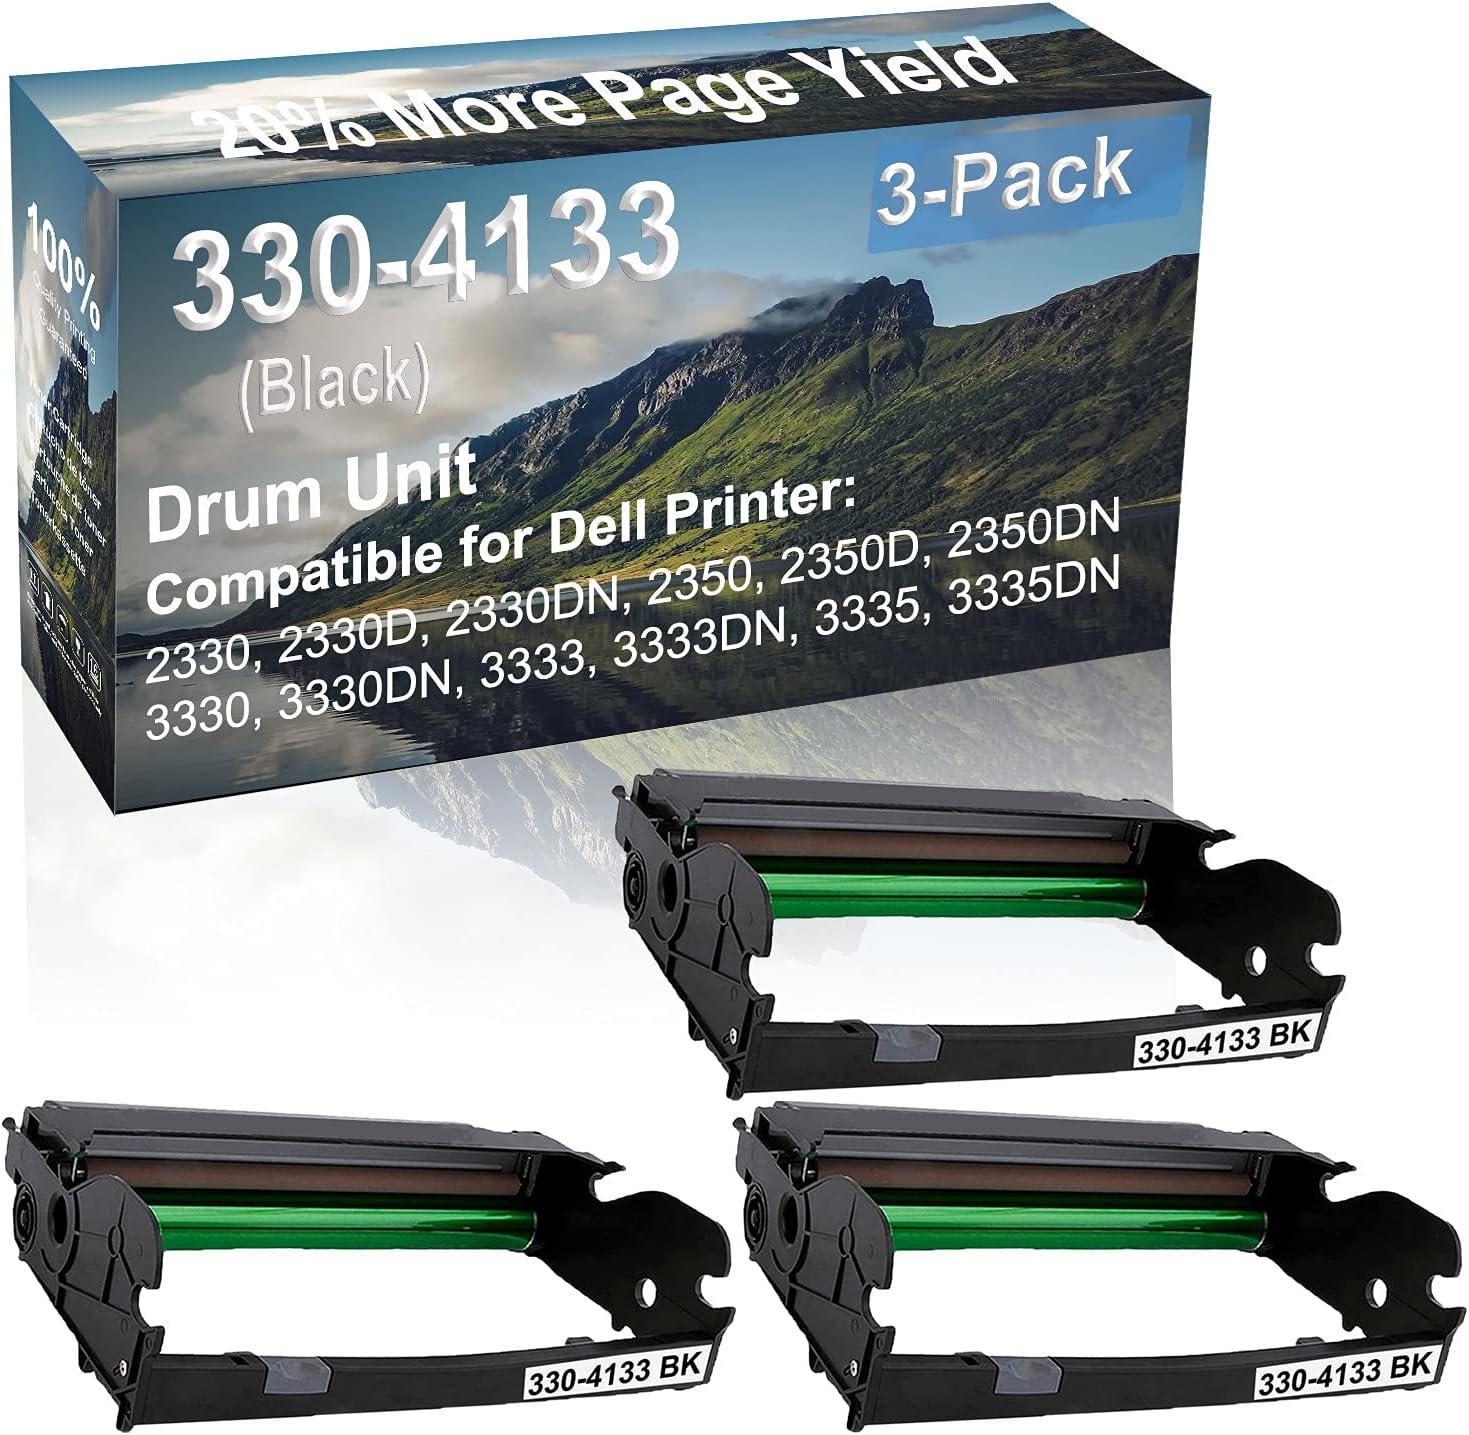 3-Pack (Black) Compatible 2350D, 2350DN, 3330, 3330DN Printer Drum Unit Replacement for Dell 330-4133 Drum Kit